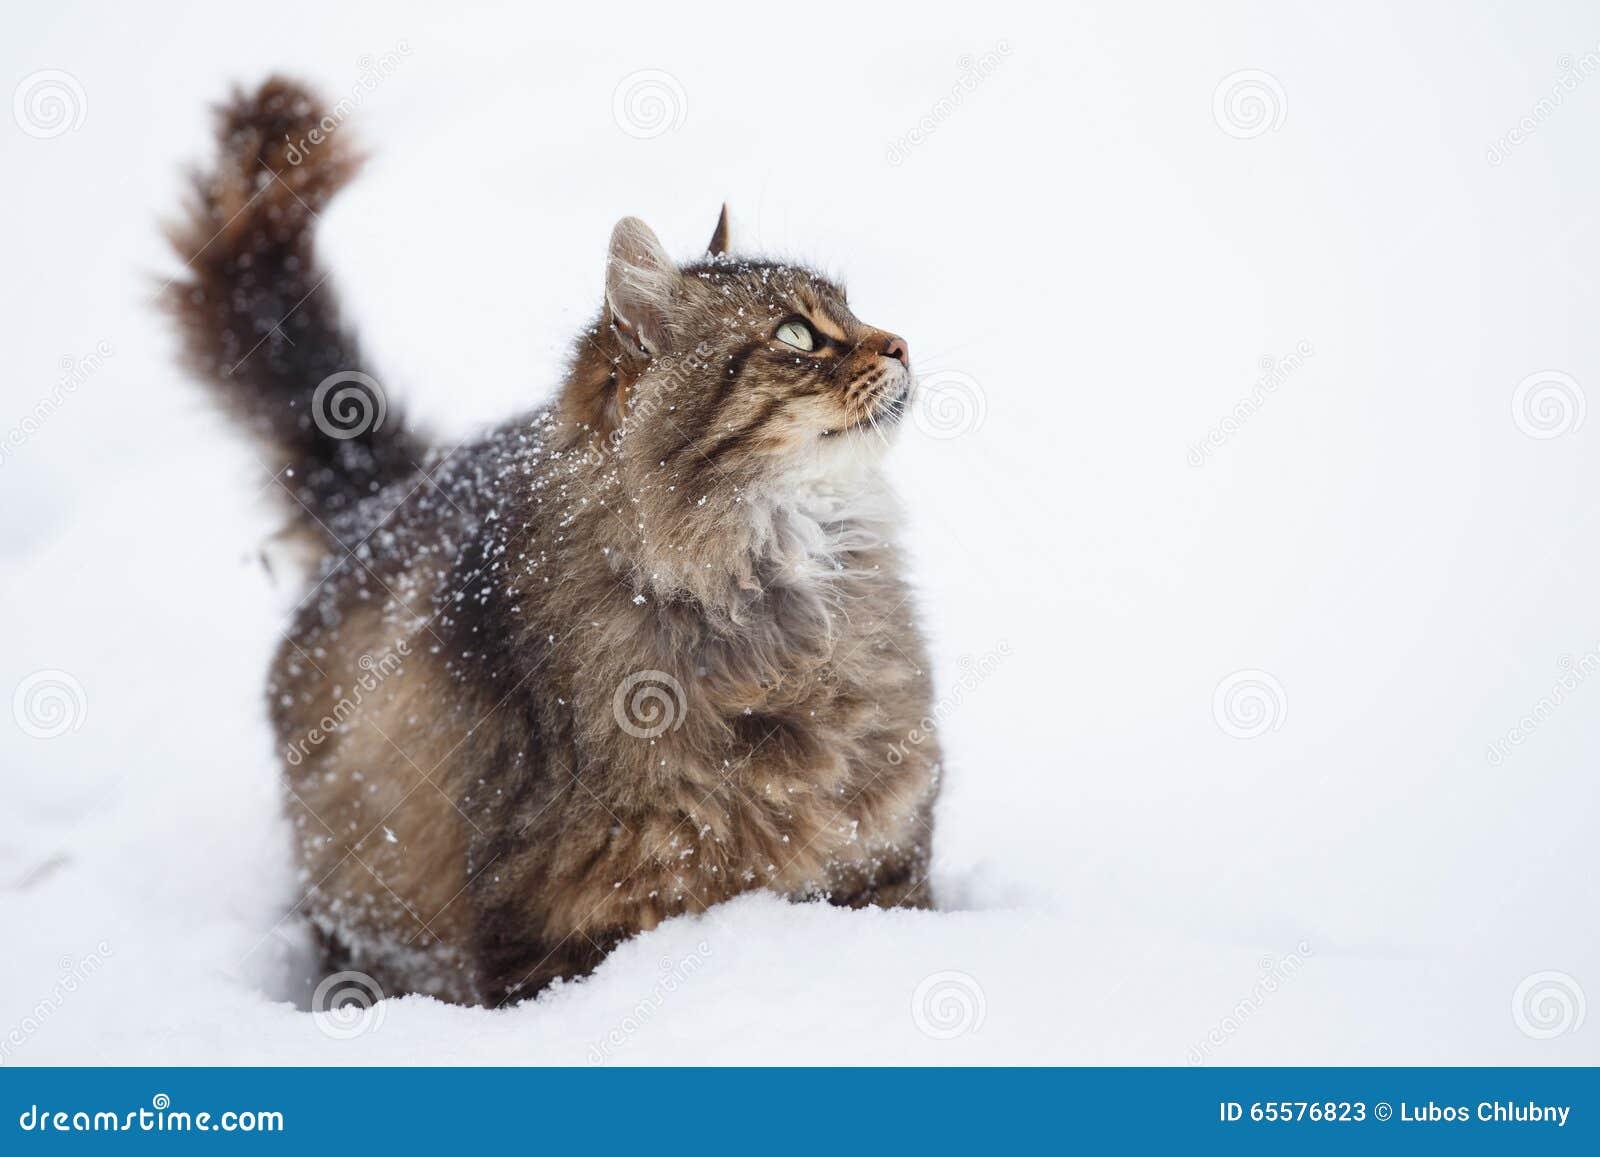 Gato de gato malhado na neve